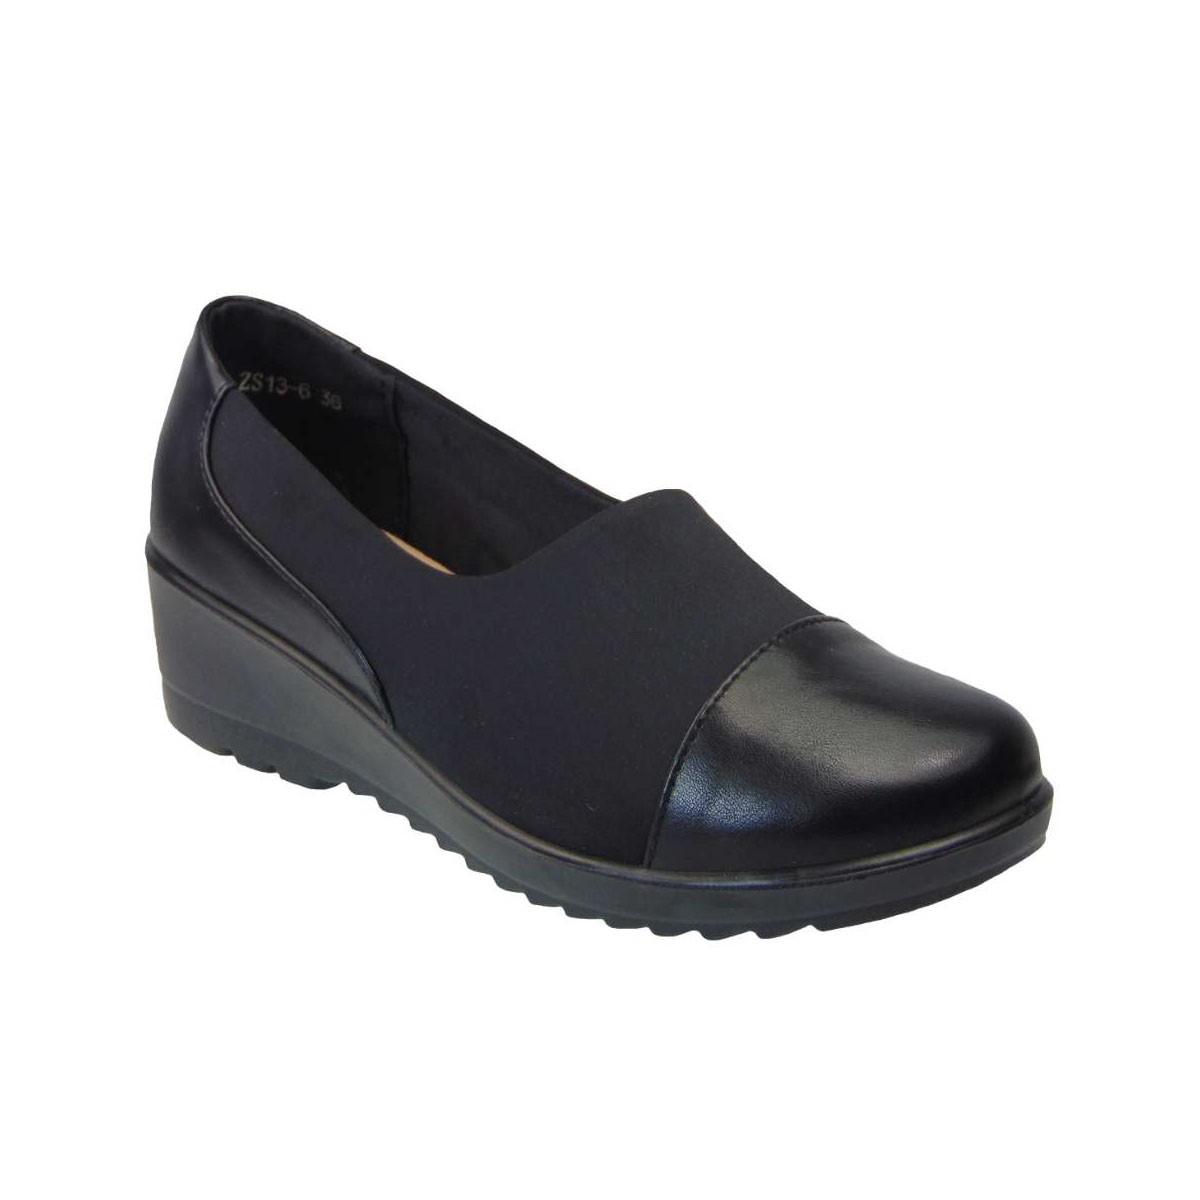 Tsimpolis Shoes ZS13-6 Γυναικείο Slip On Από Ενισχυμένο Stretch Μαύρο